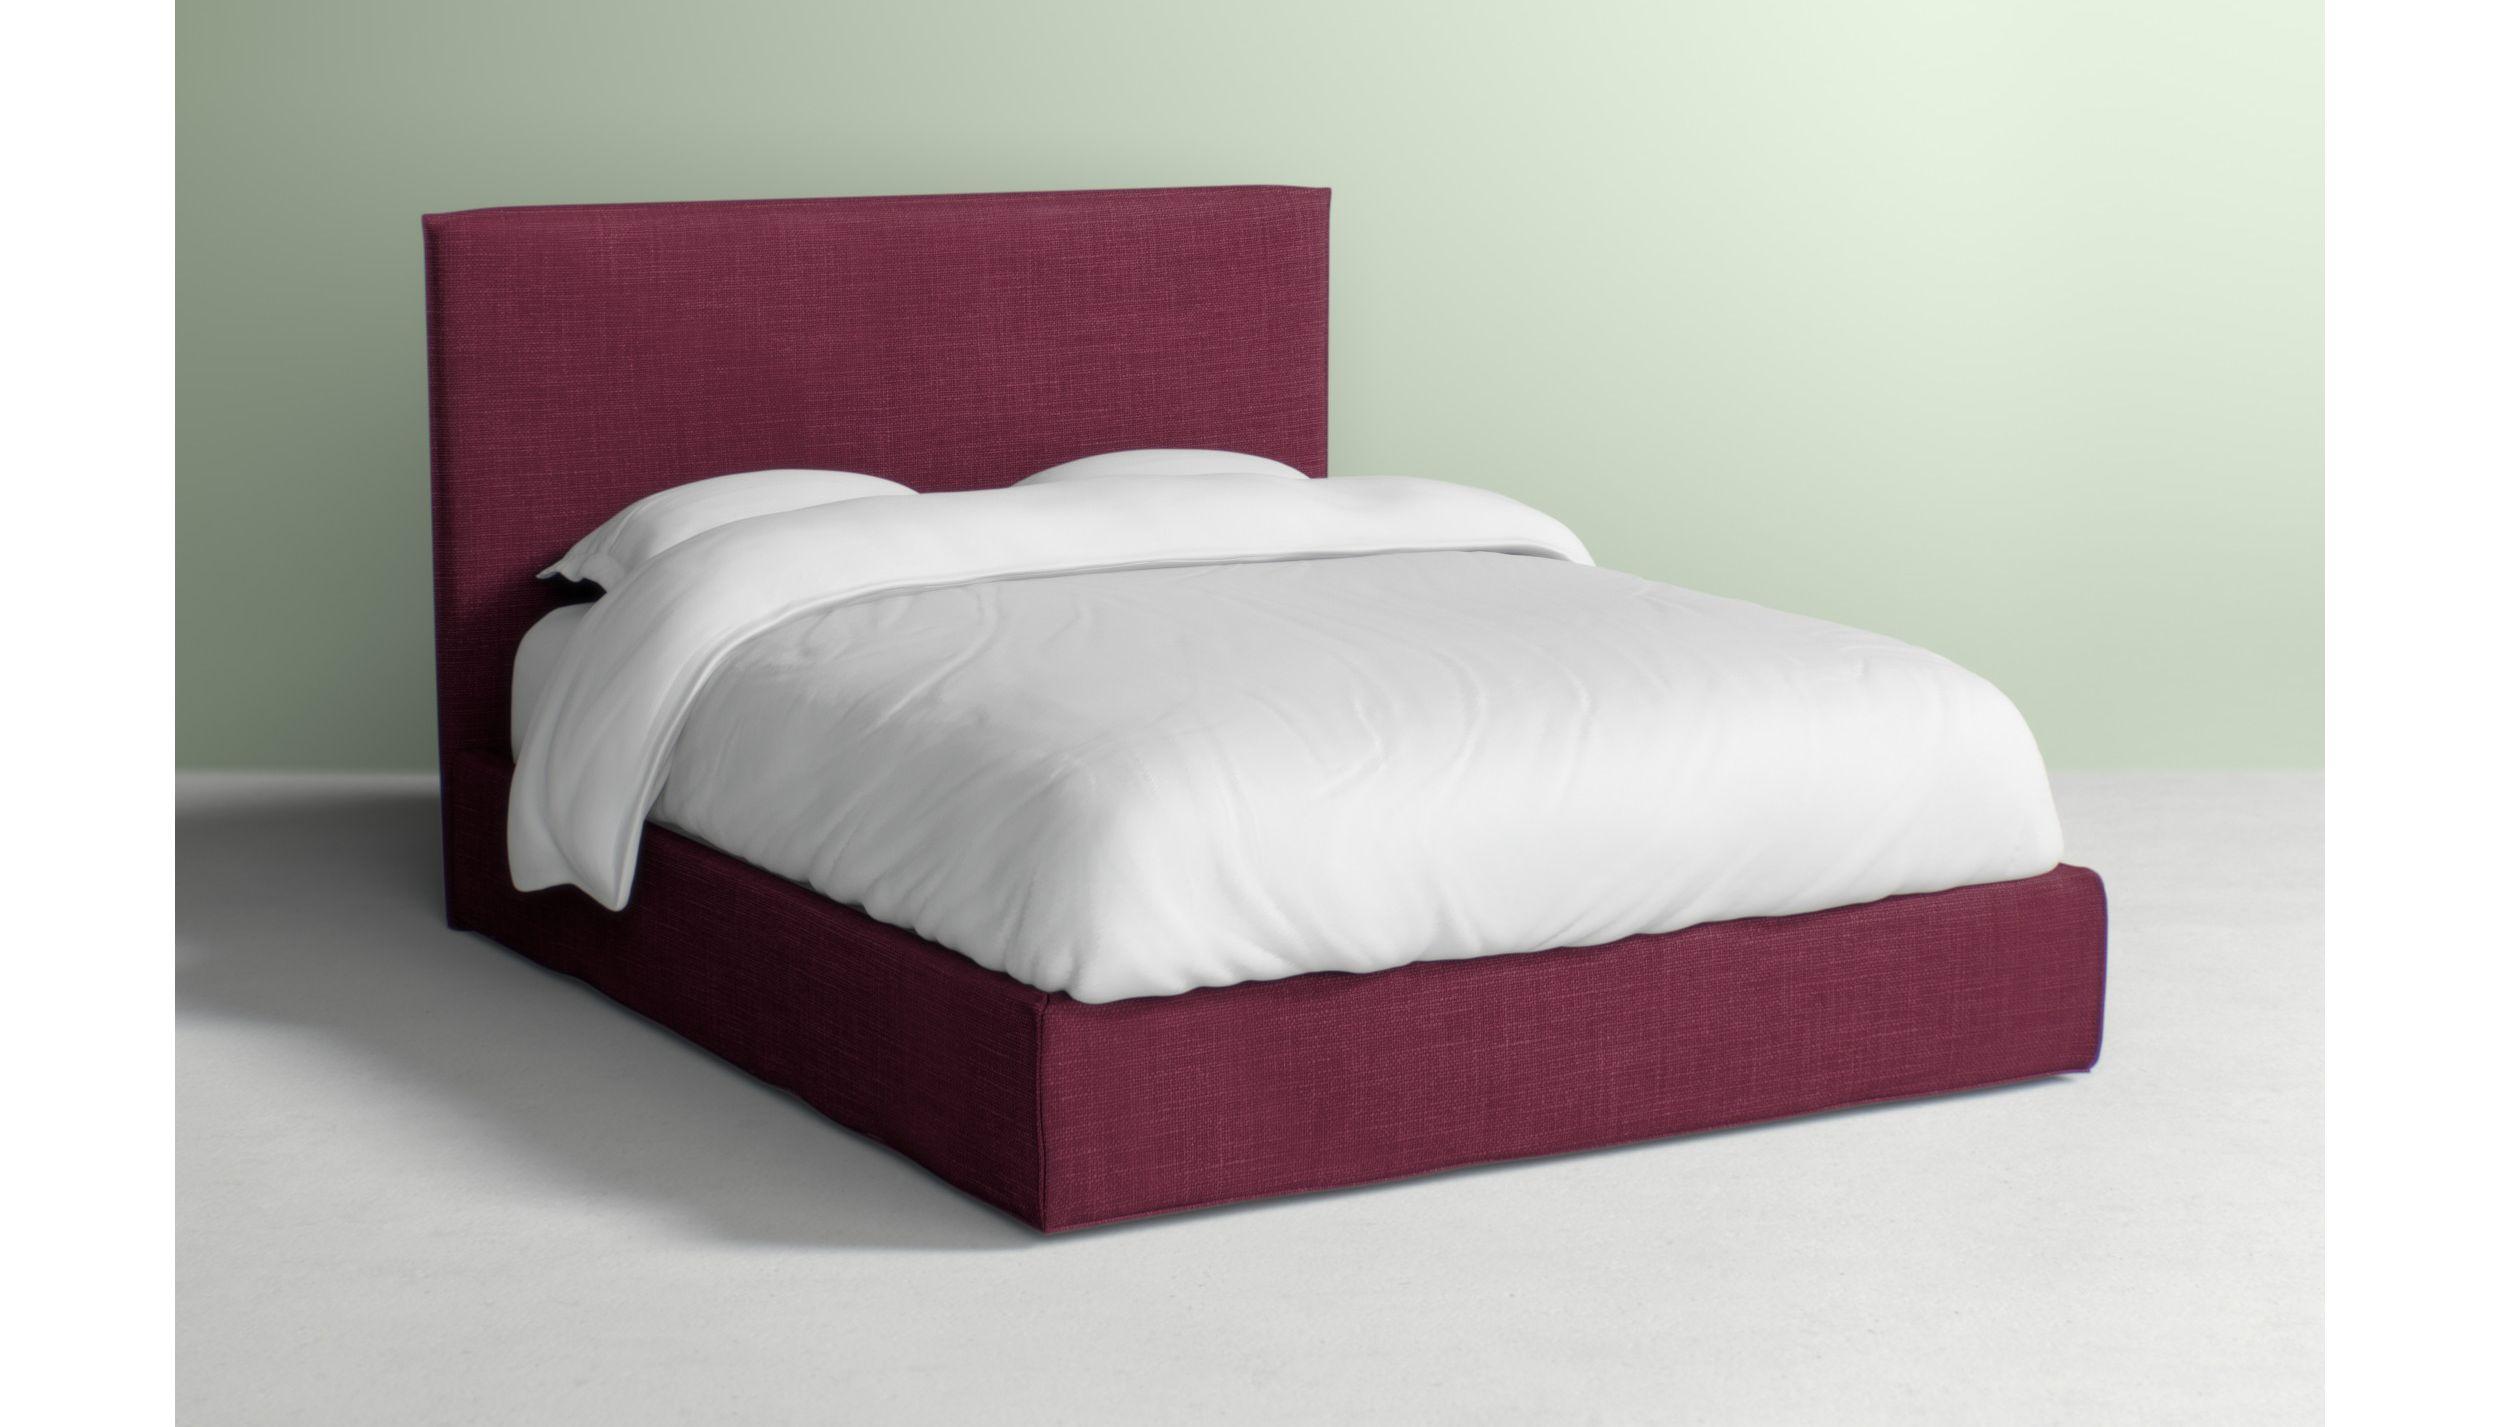 Custom Bunk Beds Miami